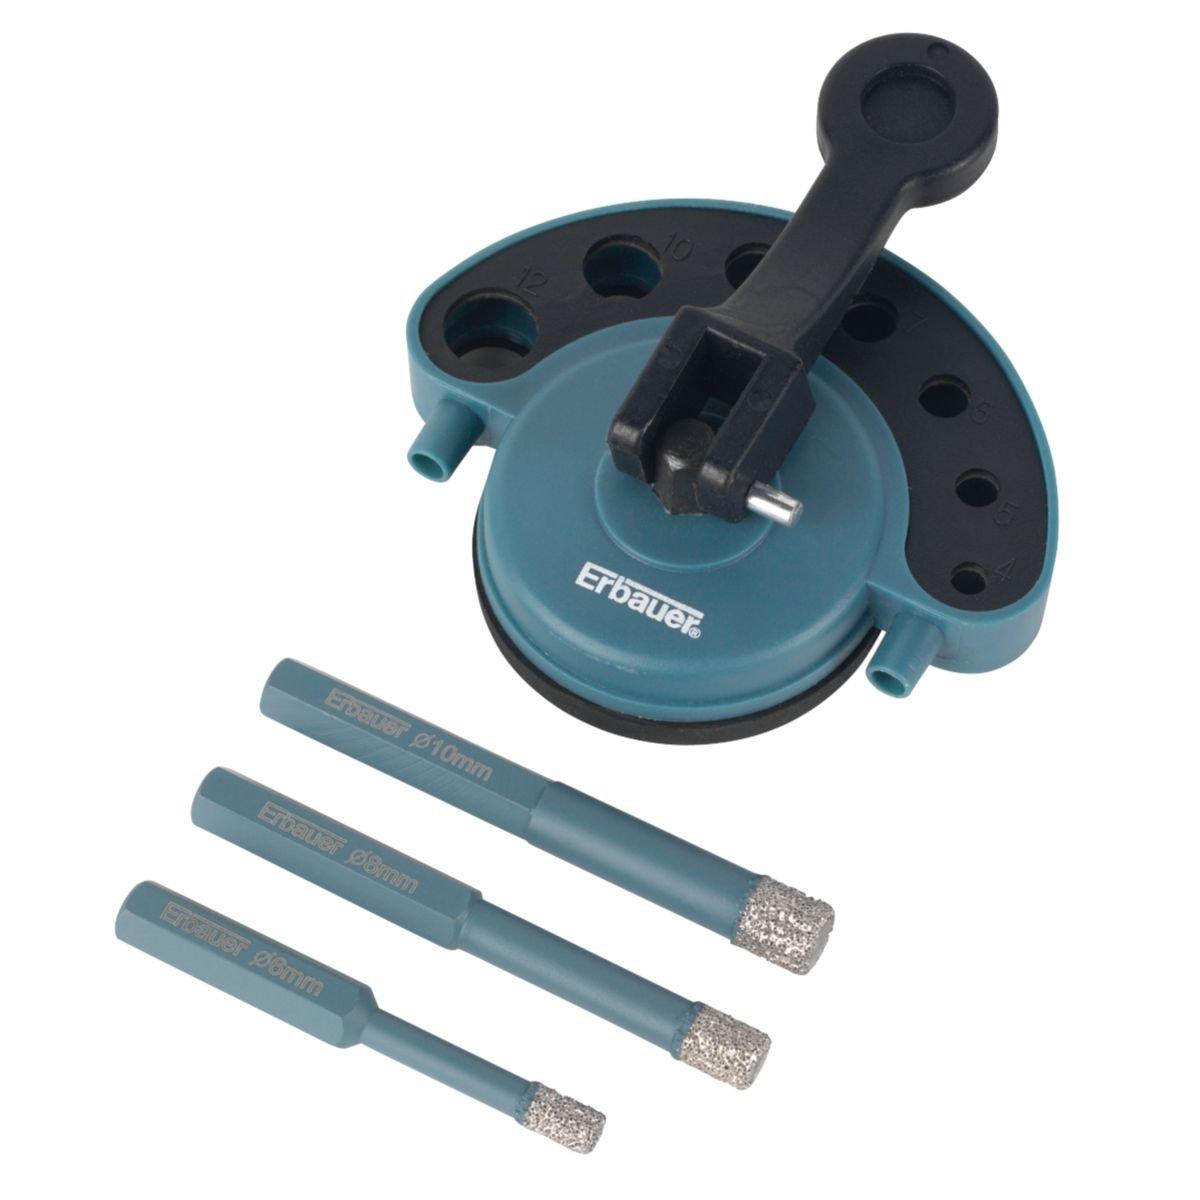 Erbauer Diamond Tile Drill Bit 6mm: Amazon.co.uk: DIY & Tools